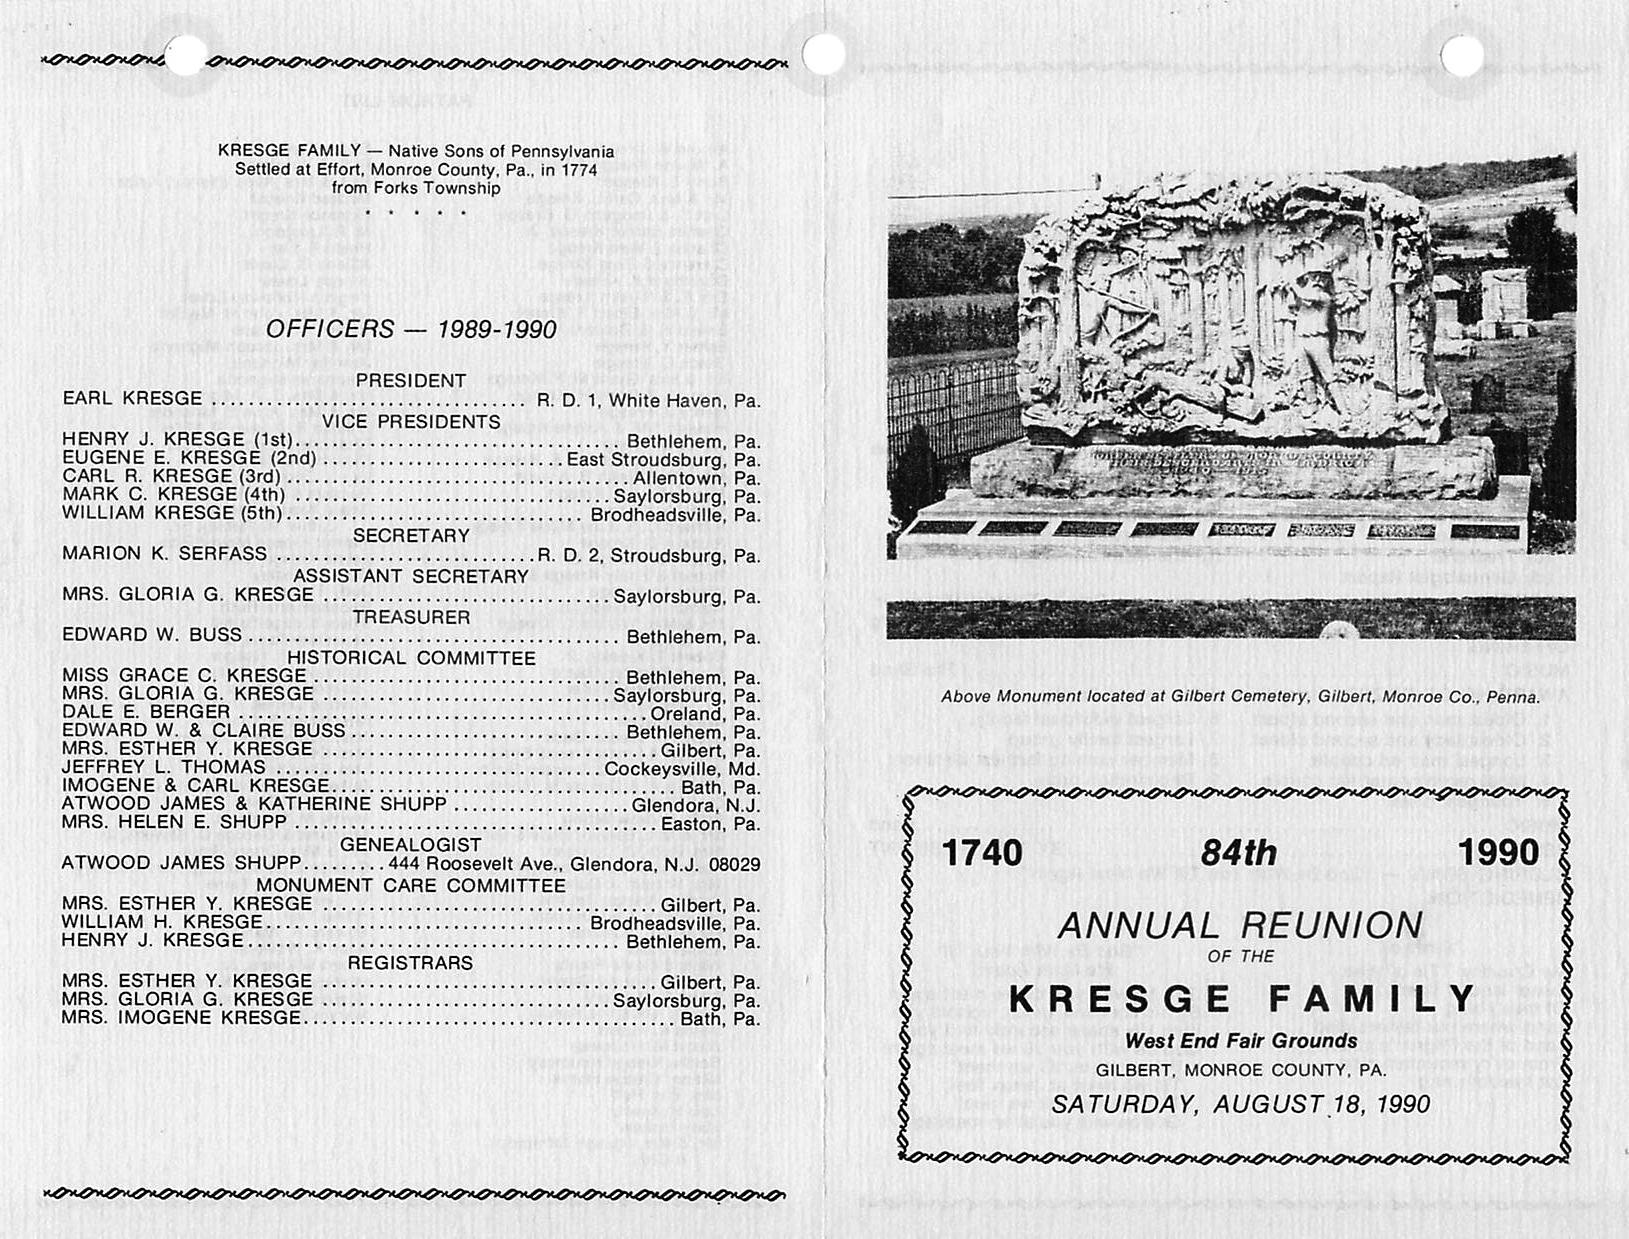 History of The Kresge Family Reunion